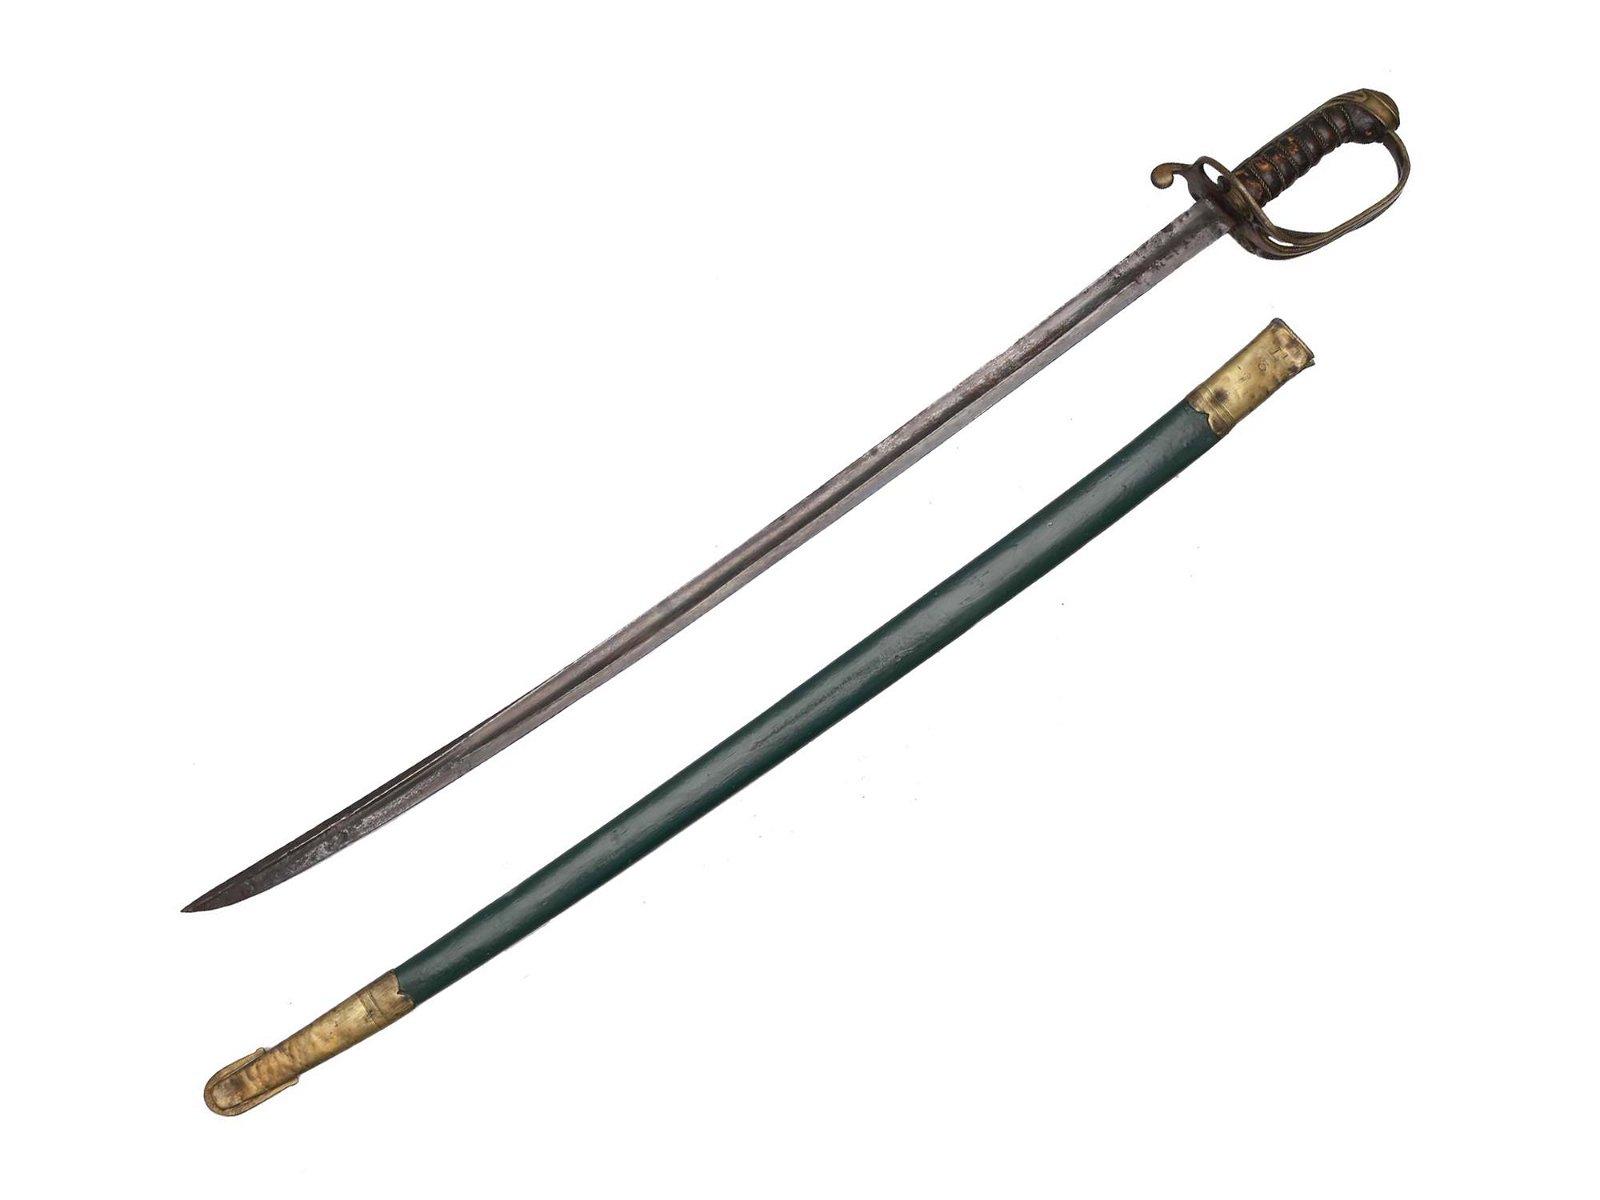 A SCARCE BRITISH WILLIAM IV 1822 PATTERN SWORD